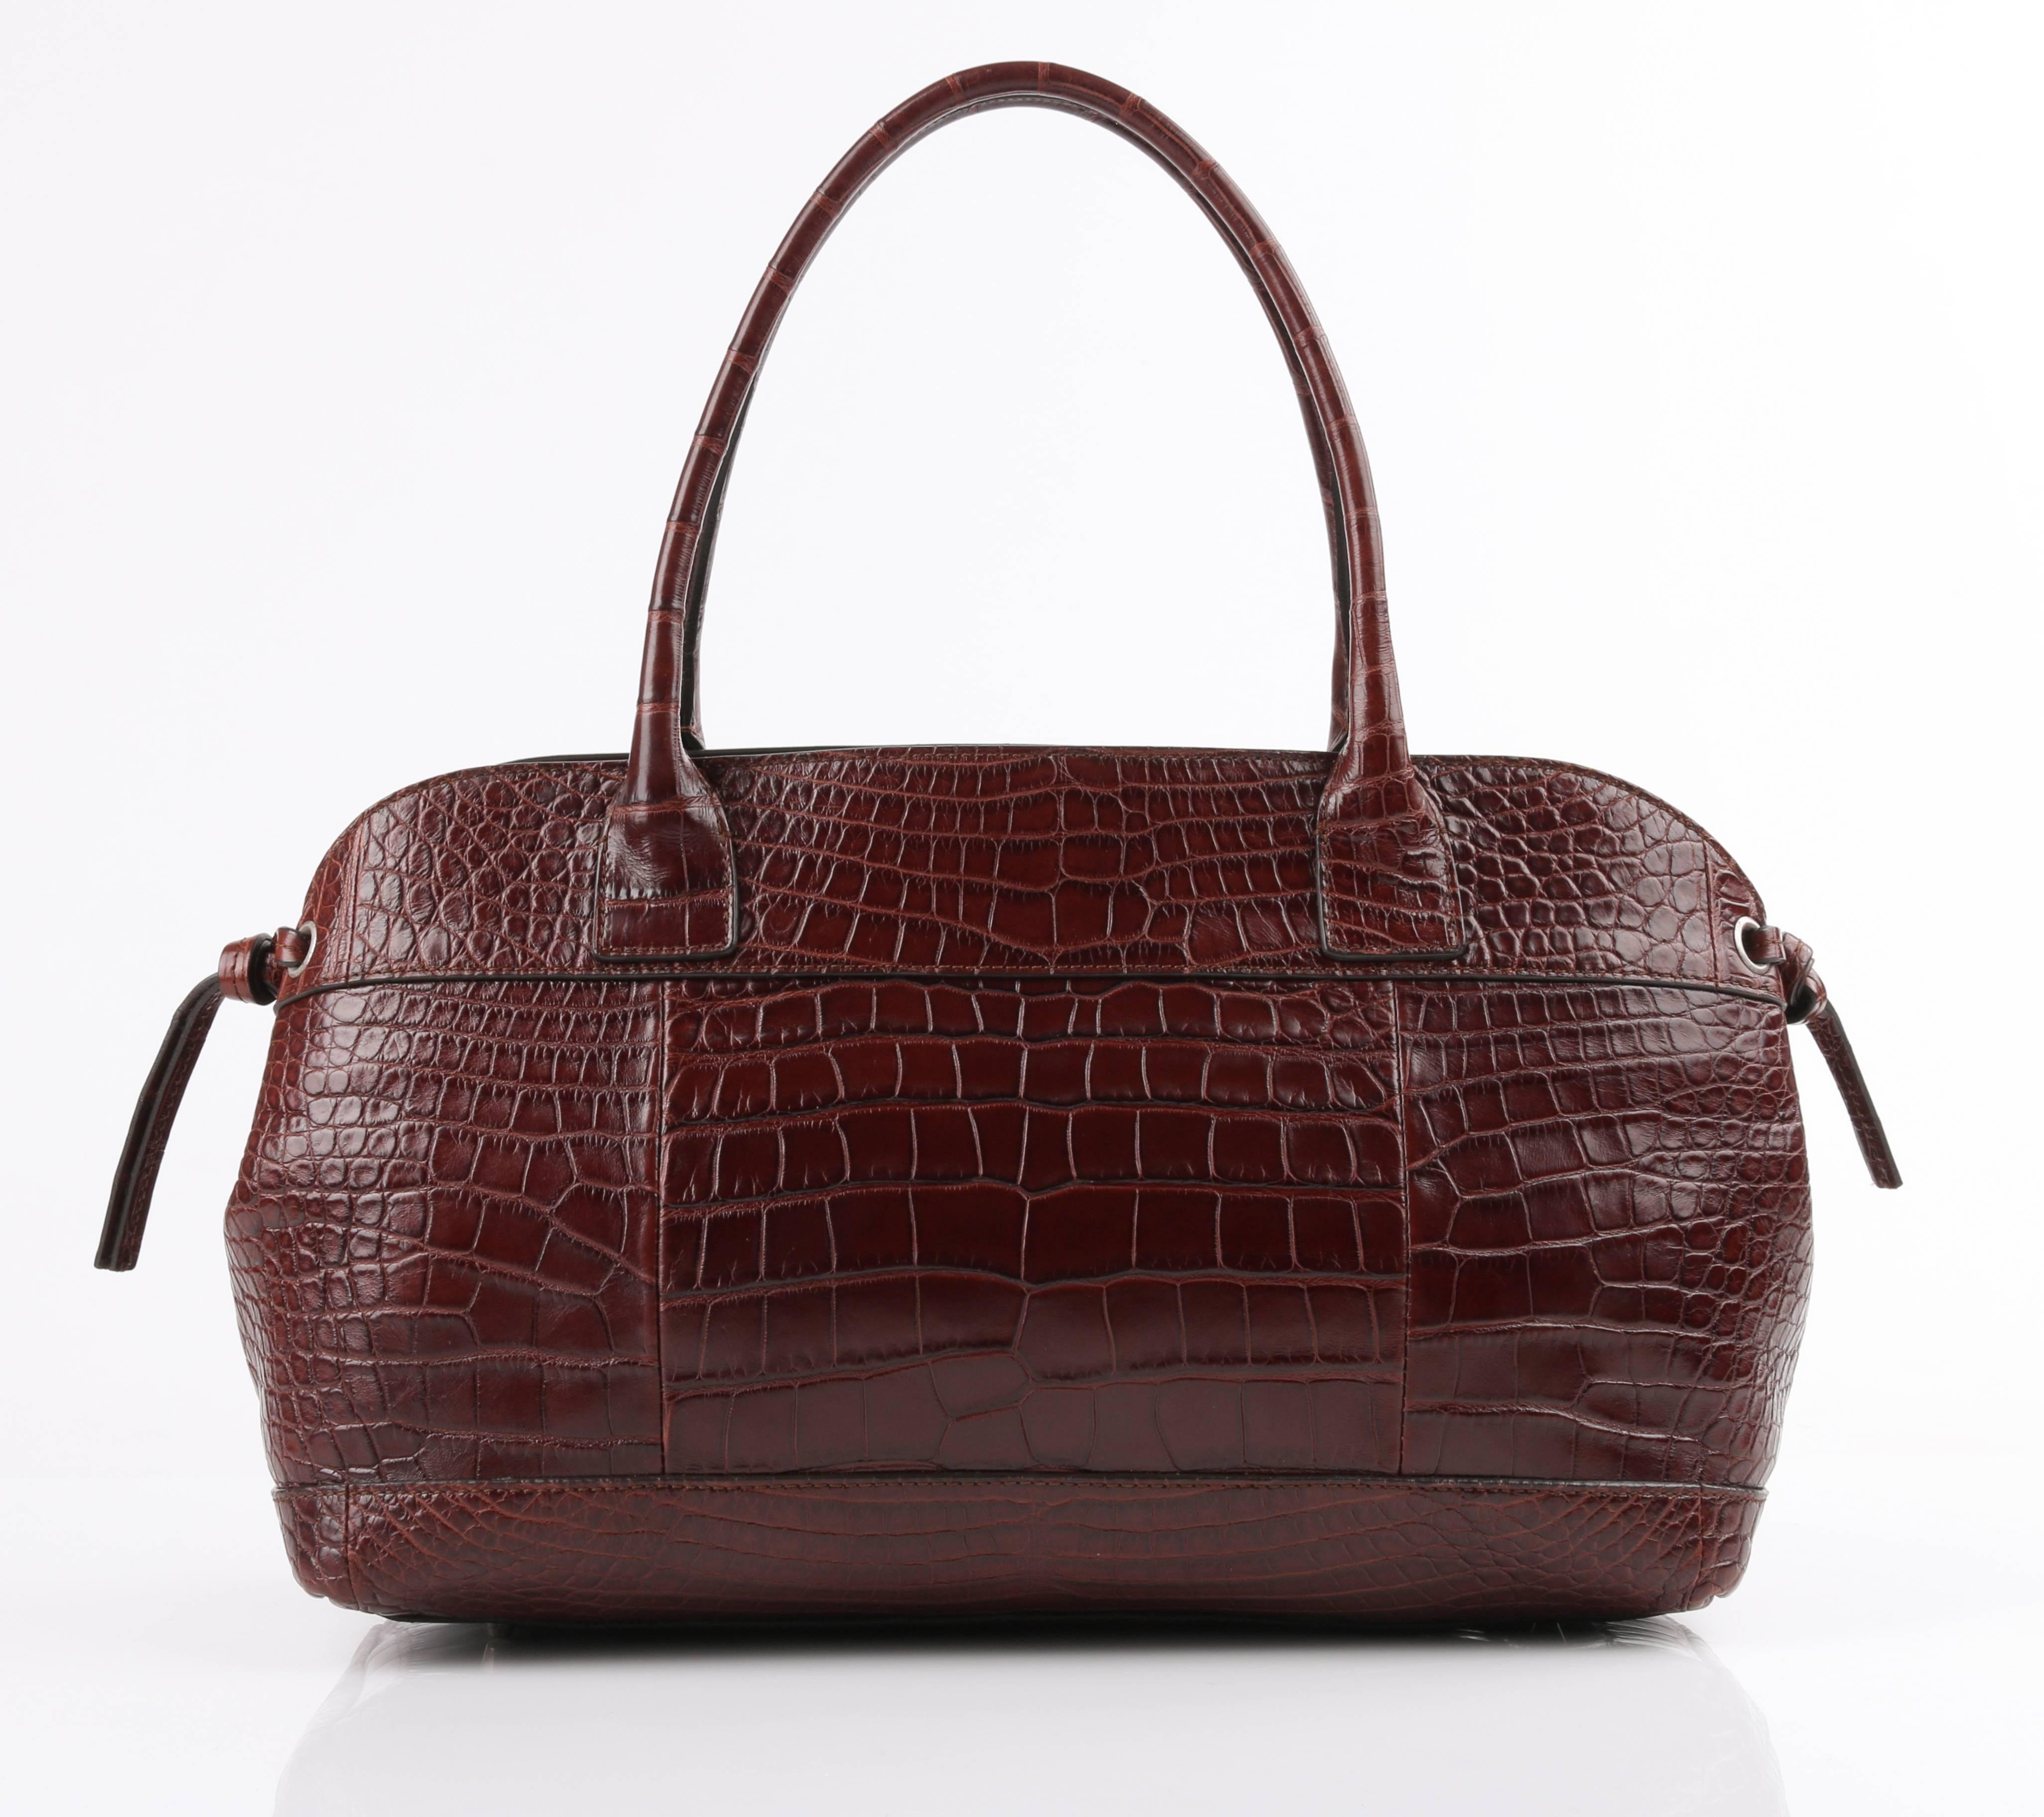 Brunello Cucinelli Brown Genuine Crocodile Satchel Handbag Purse For 4ab914b9a1